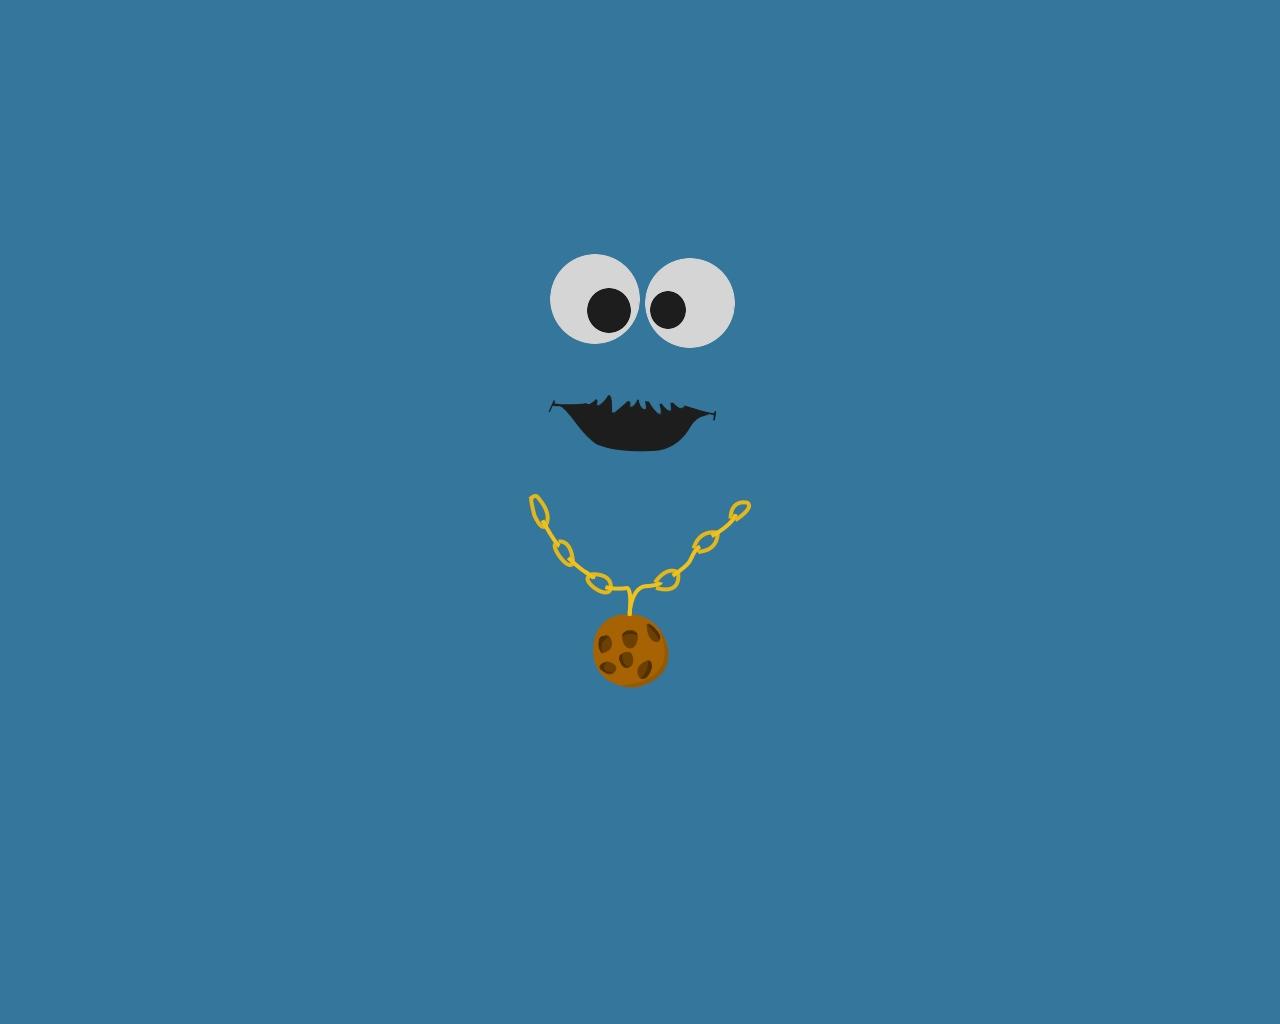 Cookie Monster Wallpaper By Ridospl On Deviantart